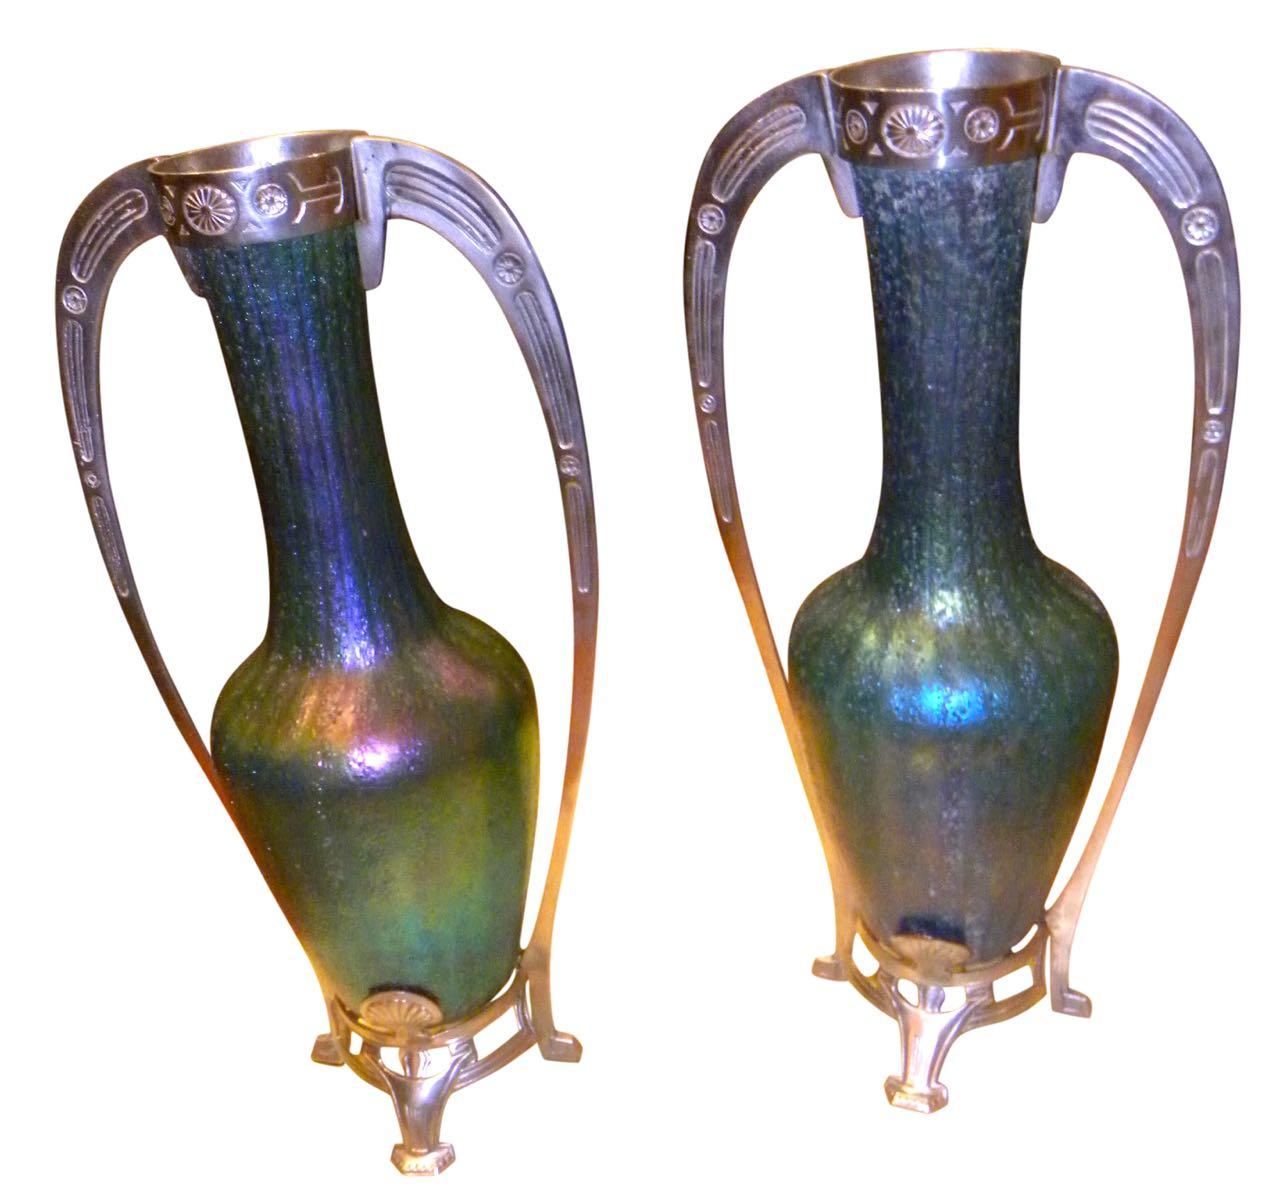 Art Nouveau Loetz Glass Vase with Metalwork